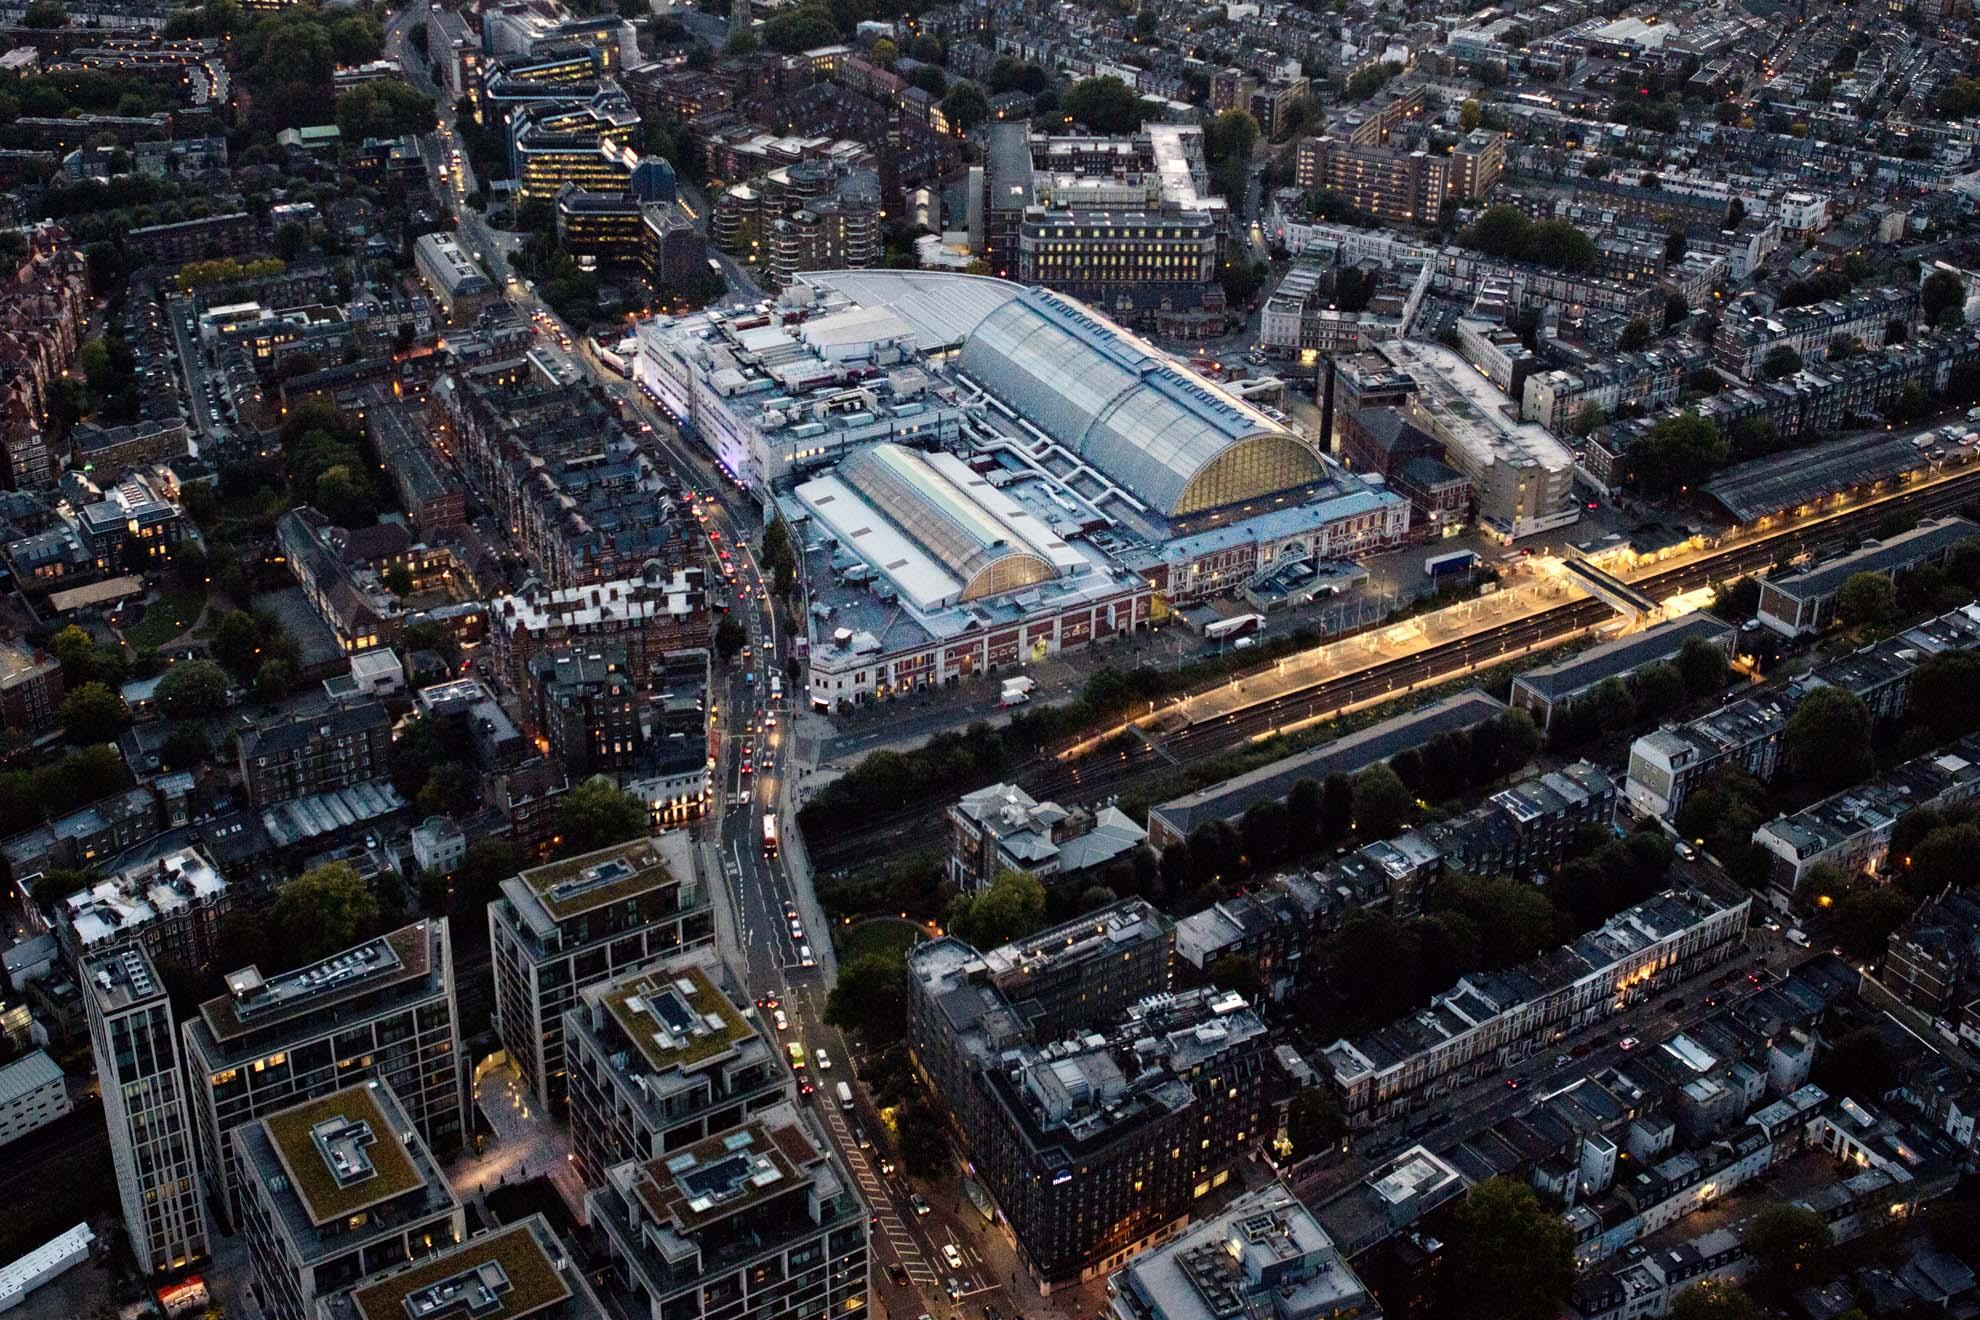 Thomas Heatherwick To Redesign Olympia London Events